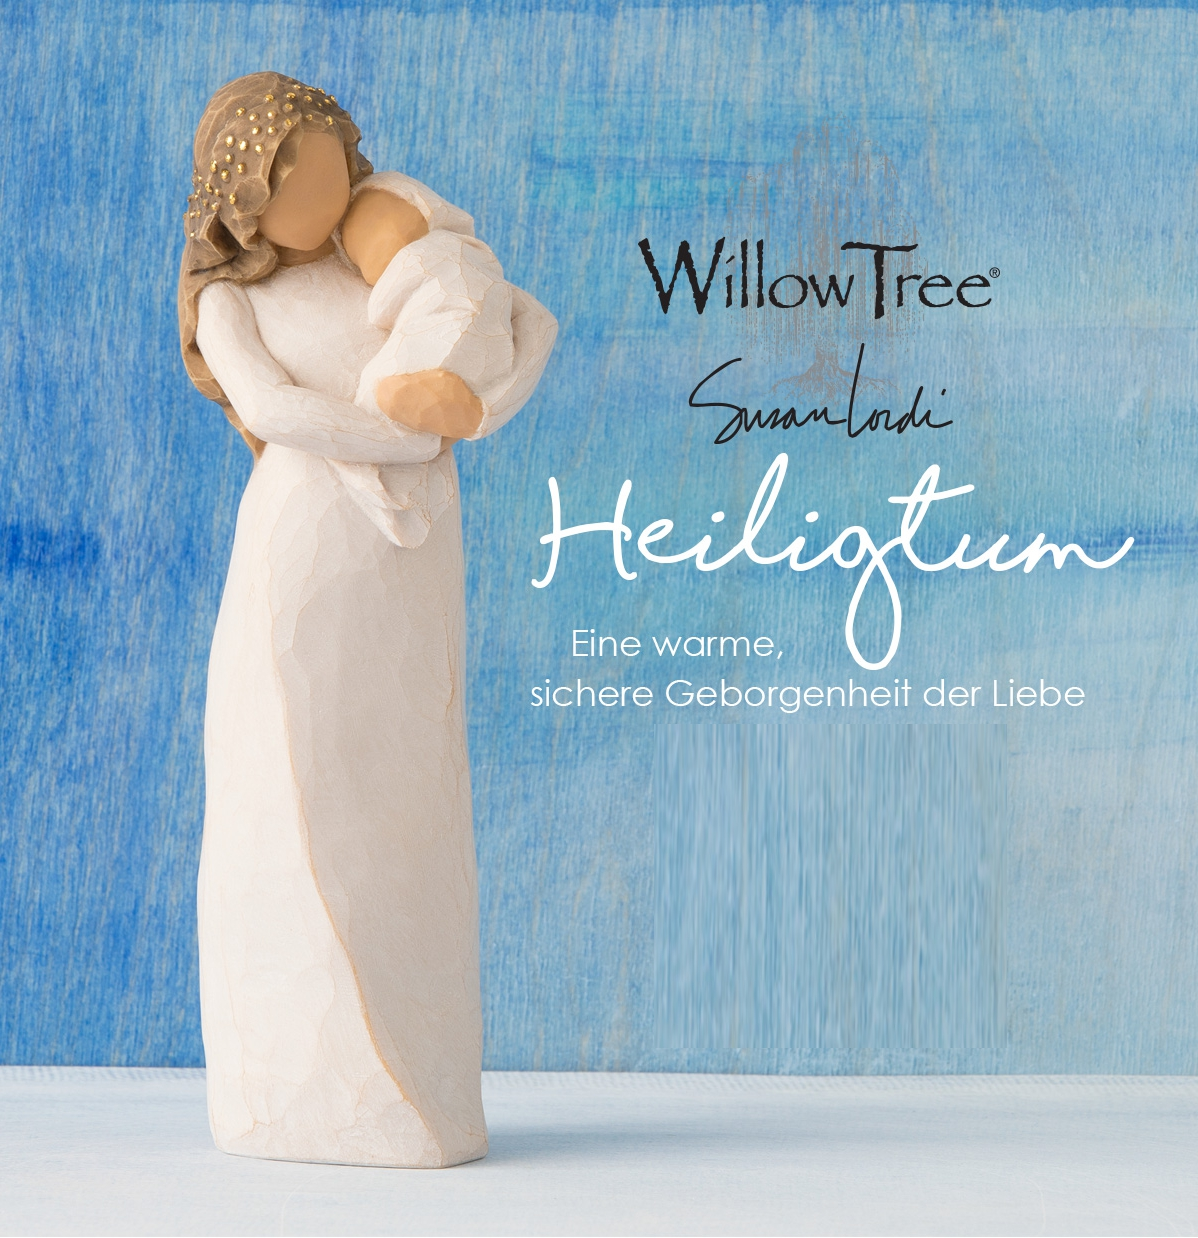 27799-Willow-Tree-Sanctuary-Heiligtum-1